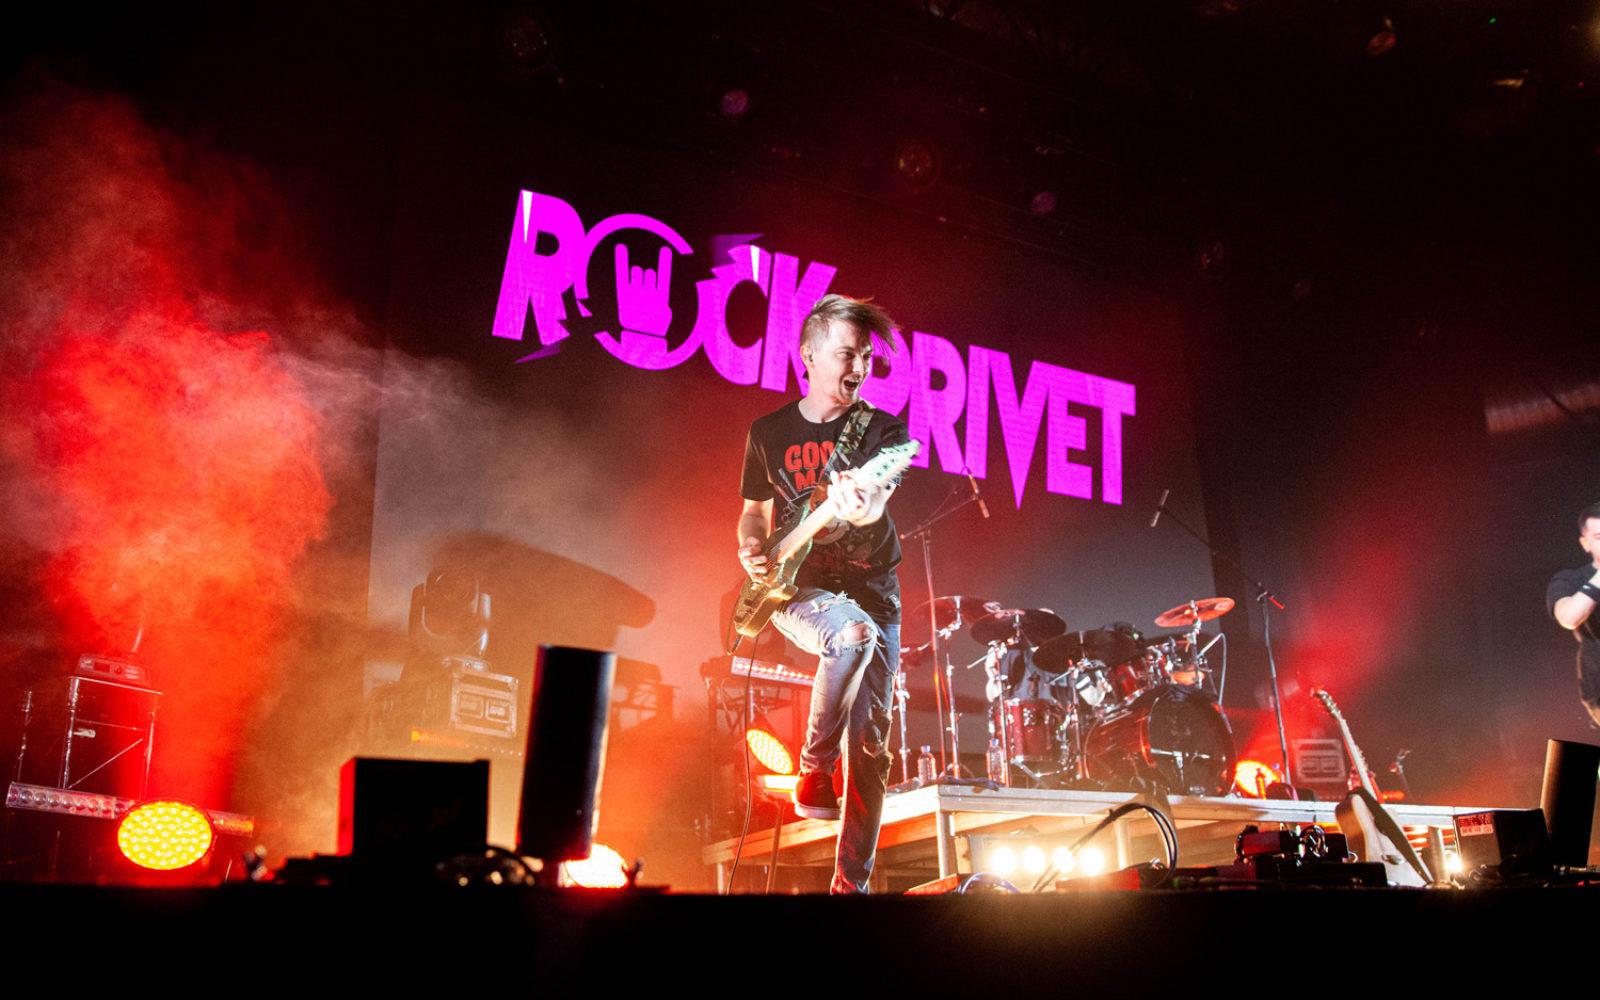 rock_privet (49 of 98)